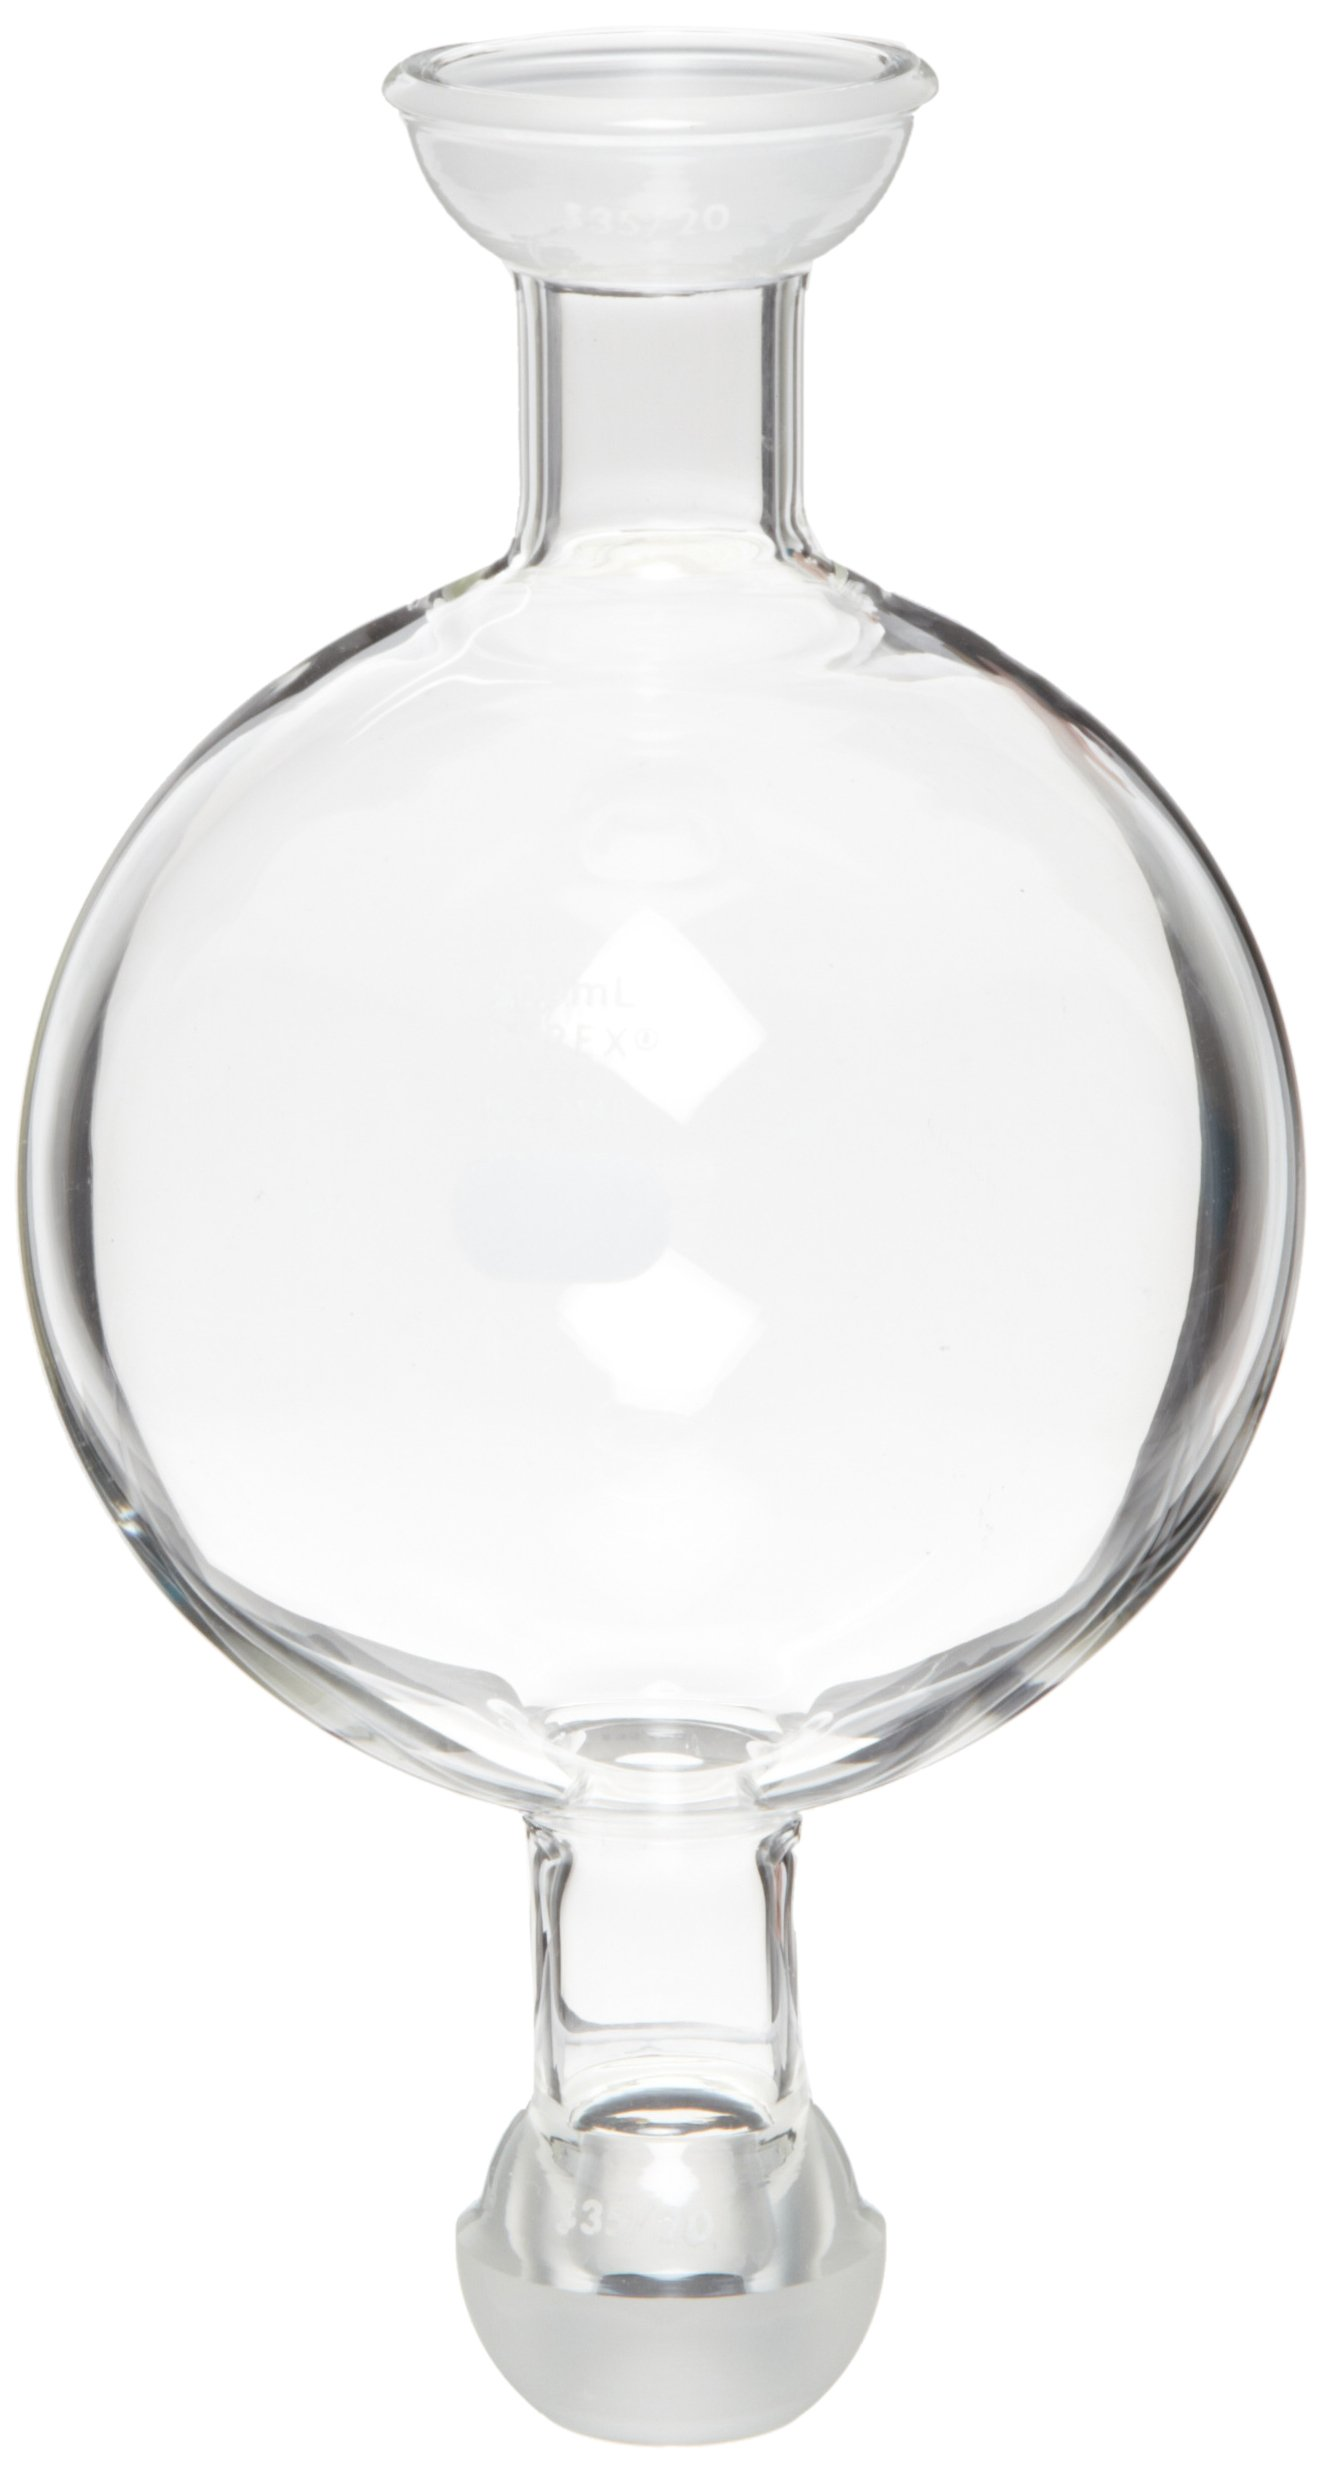 Corning Pyrex Borosilicate Glass Flash Chromatography Reservoir, 500ml Capacity